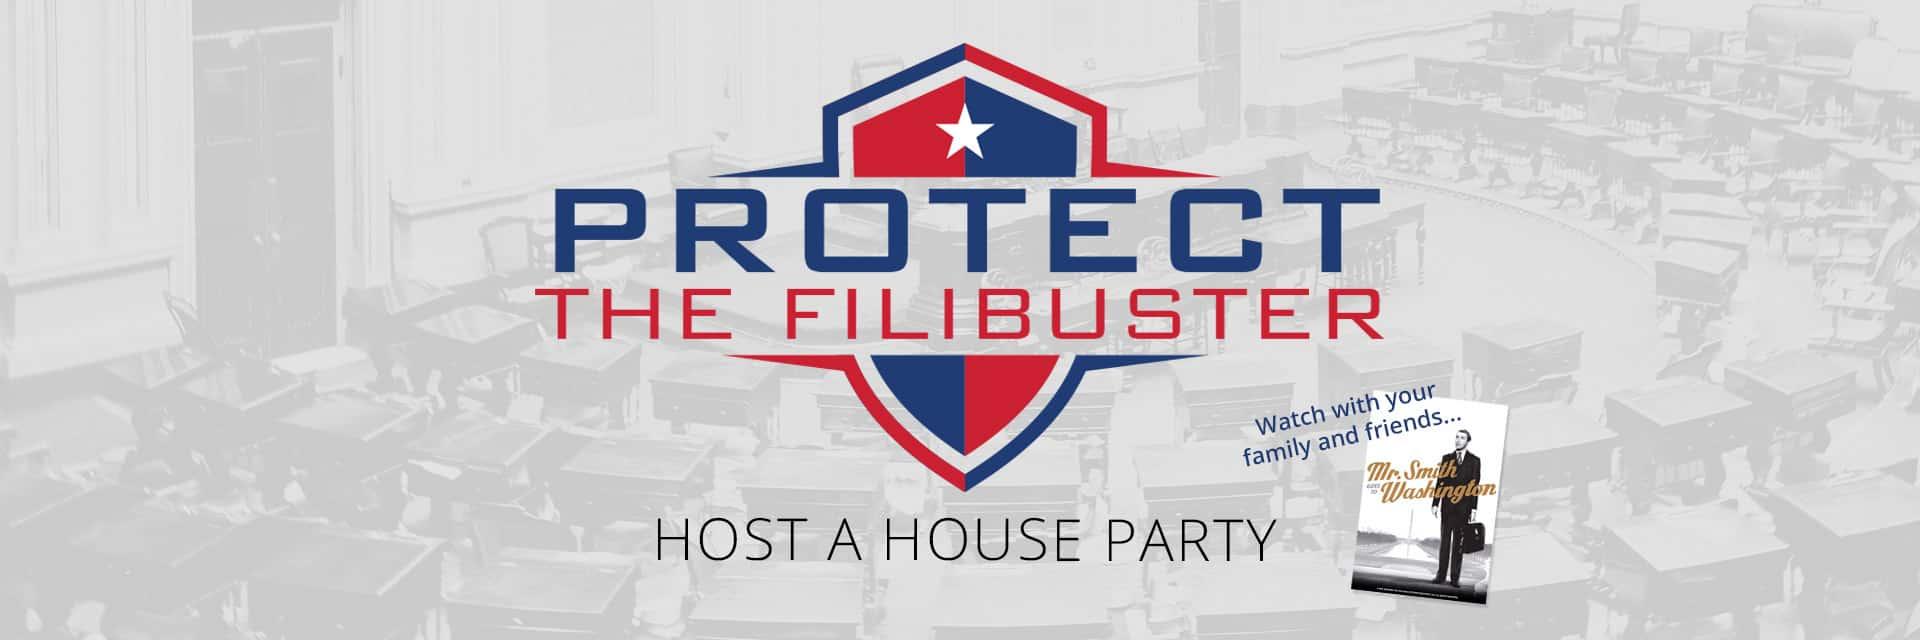 Filibuster-House-Party-Slider